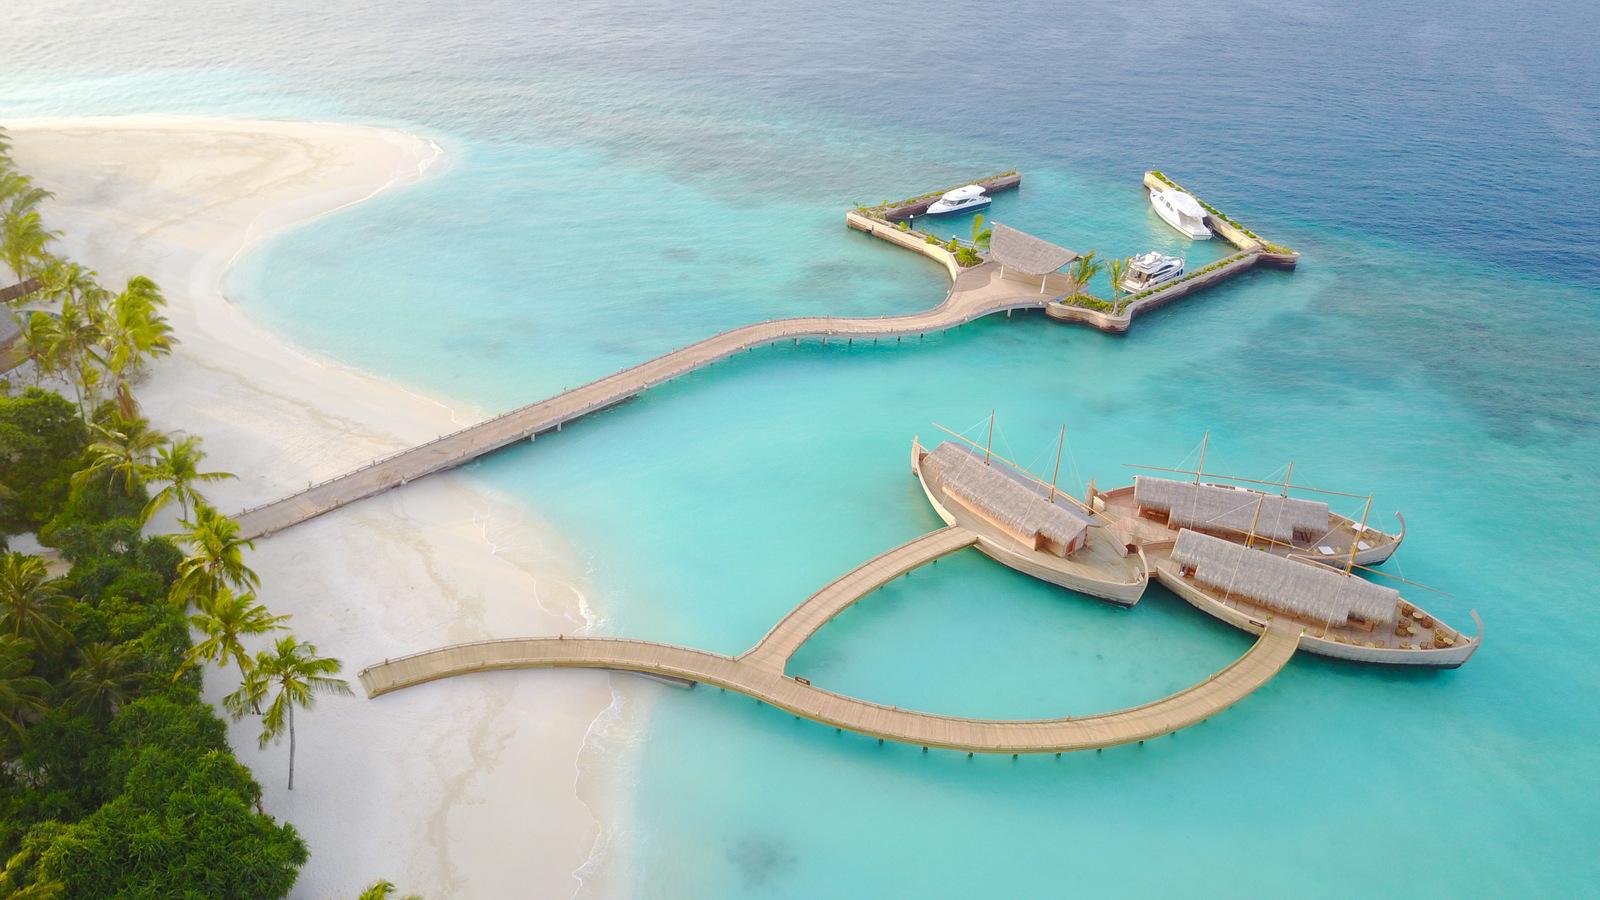 Malediven    die neue Trauminsel Milaidhoo im Baa Atoll strand sonne reisebericht malediven honeymoon 2  TUI Berlin Reisebüro Malediven Milaidhoo Luftaufnahme Jetty